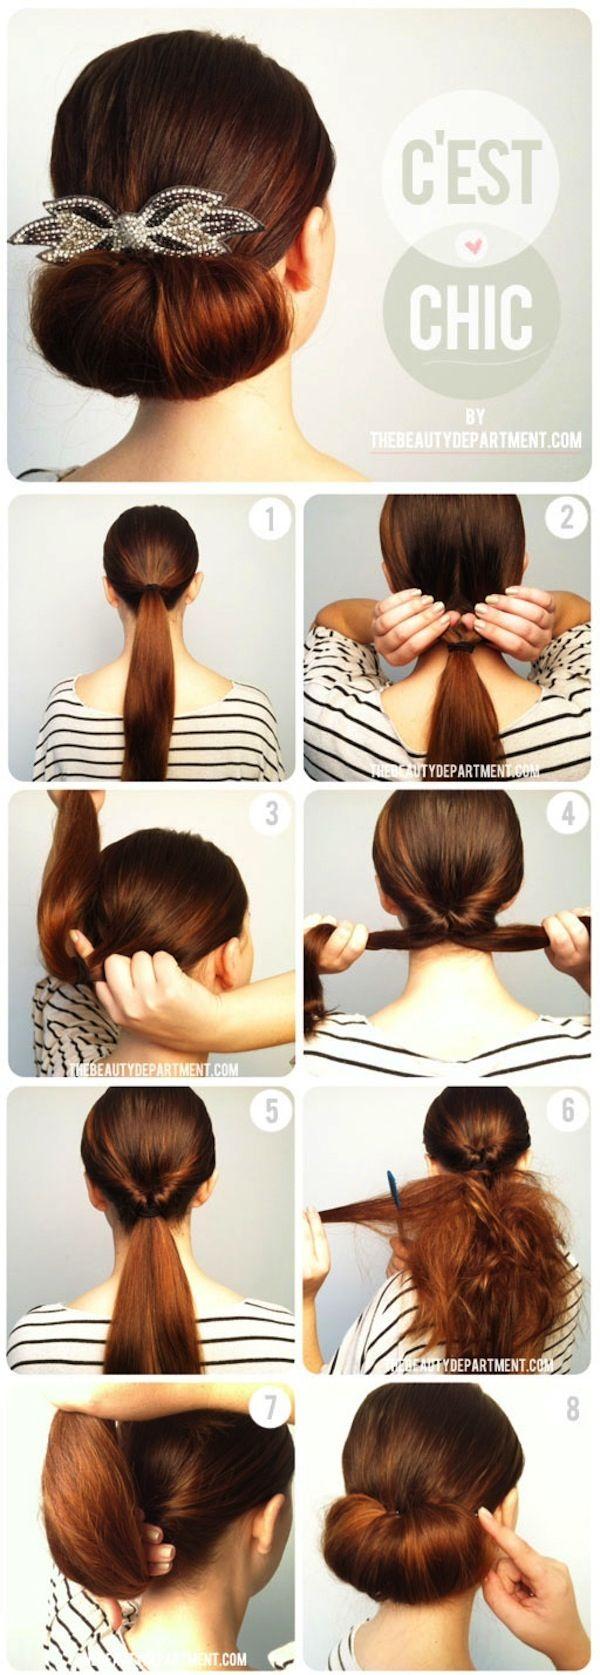 wedding hair inspiration & tutorials: the classic chignon | chignons